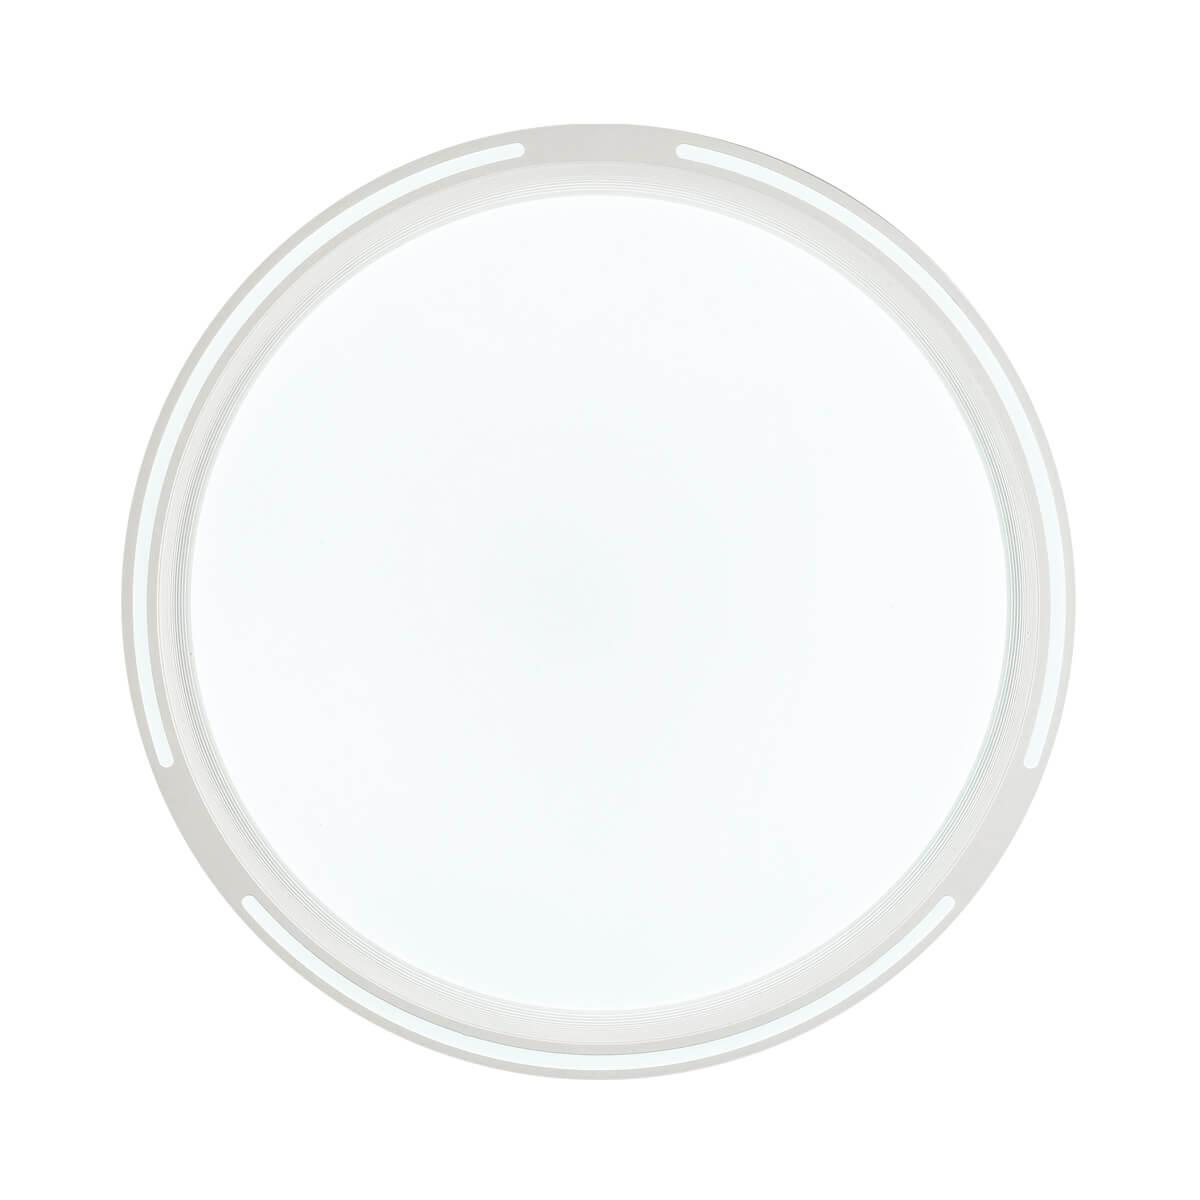 Светильник Sonex 3028/EL carlo gattini avosso 3028 3028 01